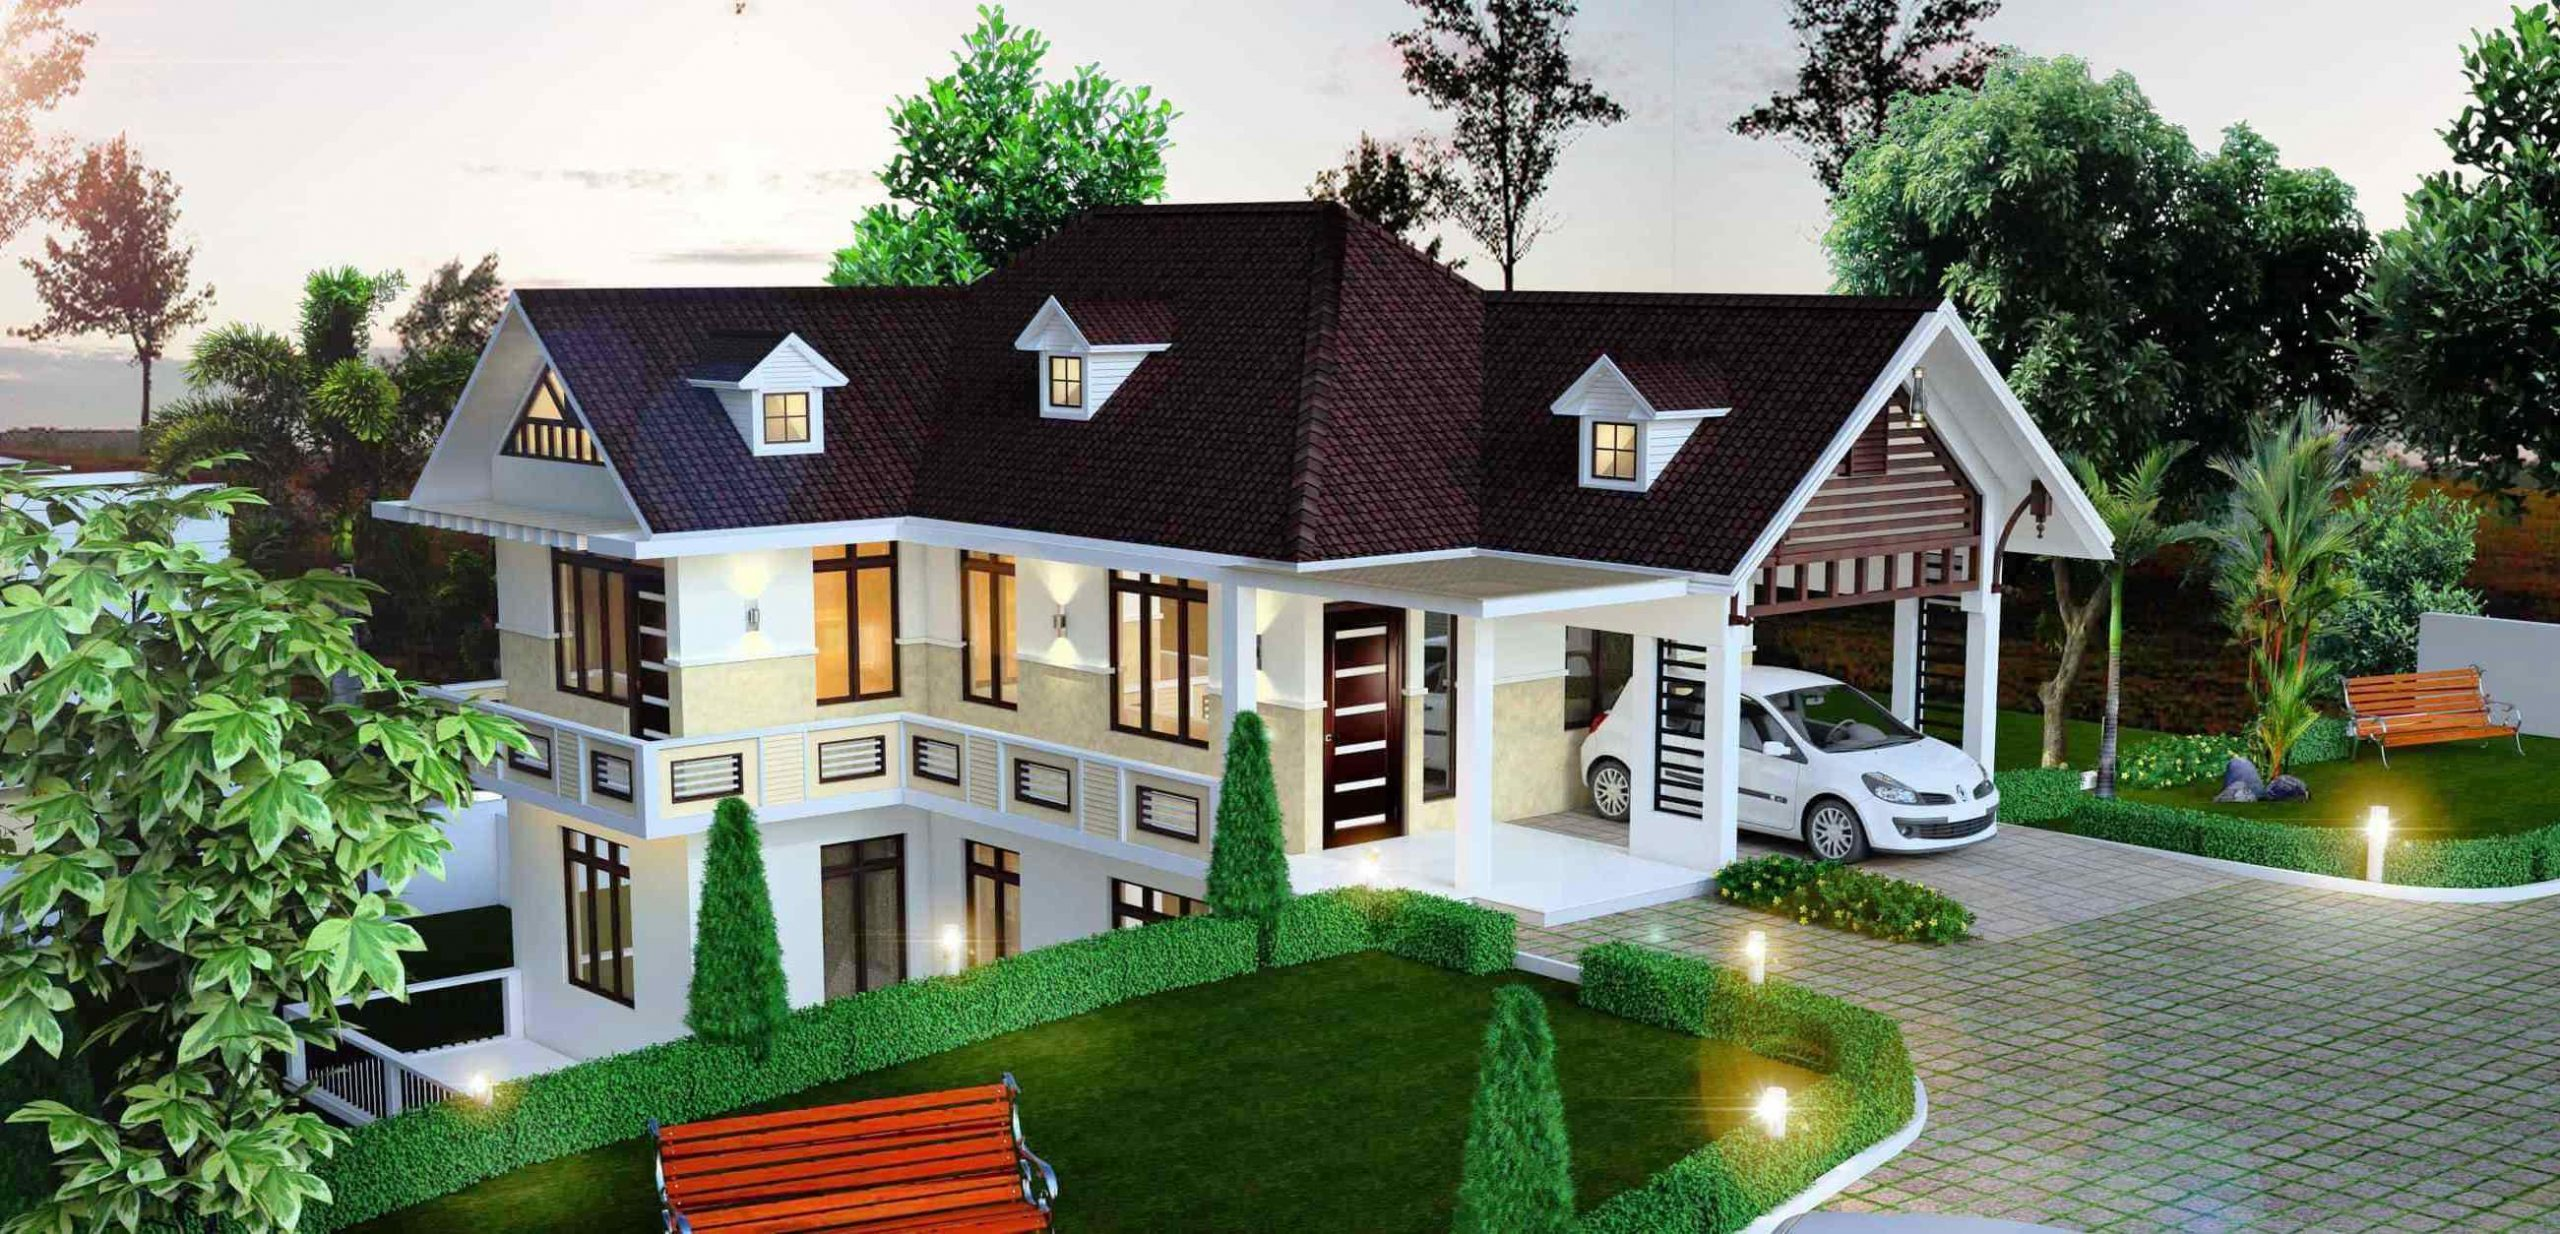 Hillside Free Modern House Plans — Schmidt Gallery Design